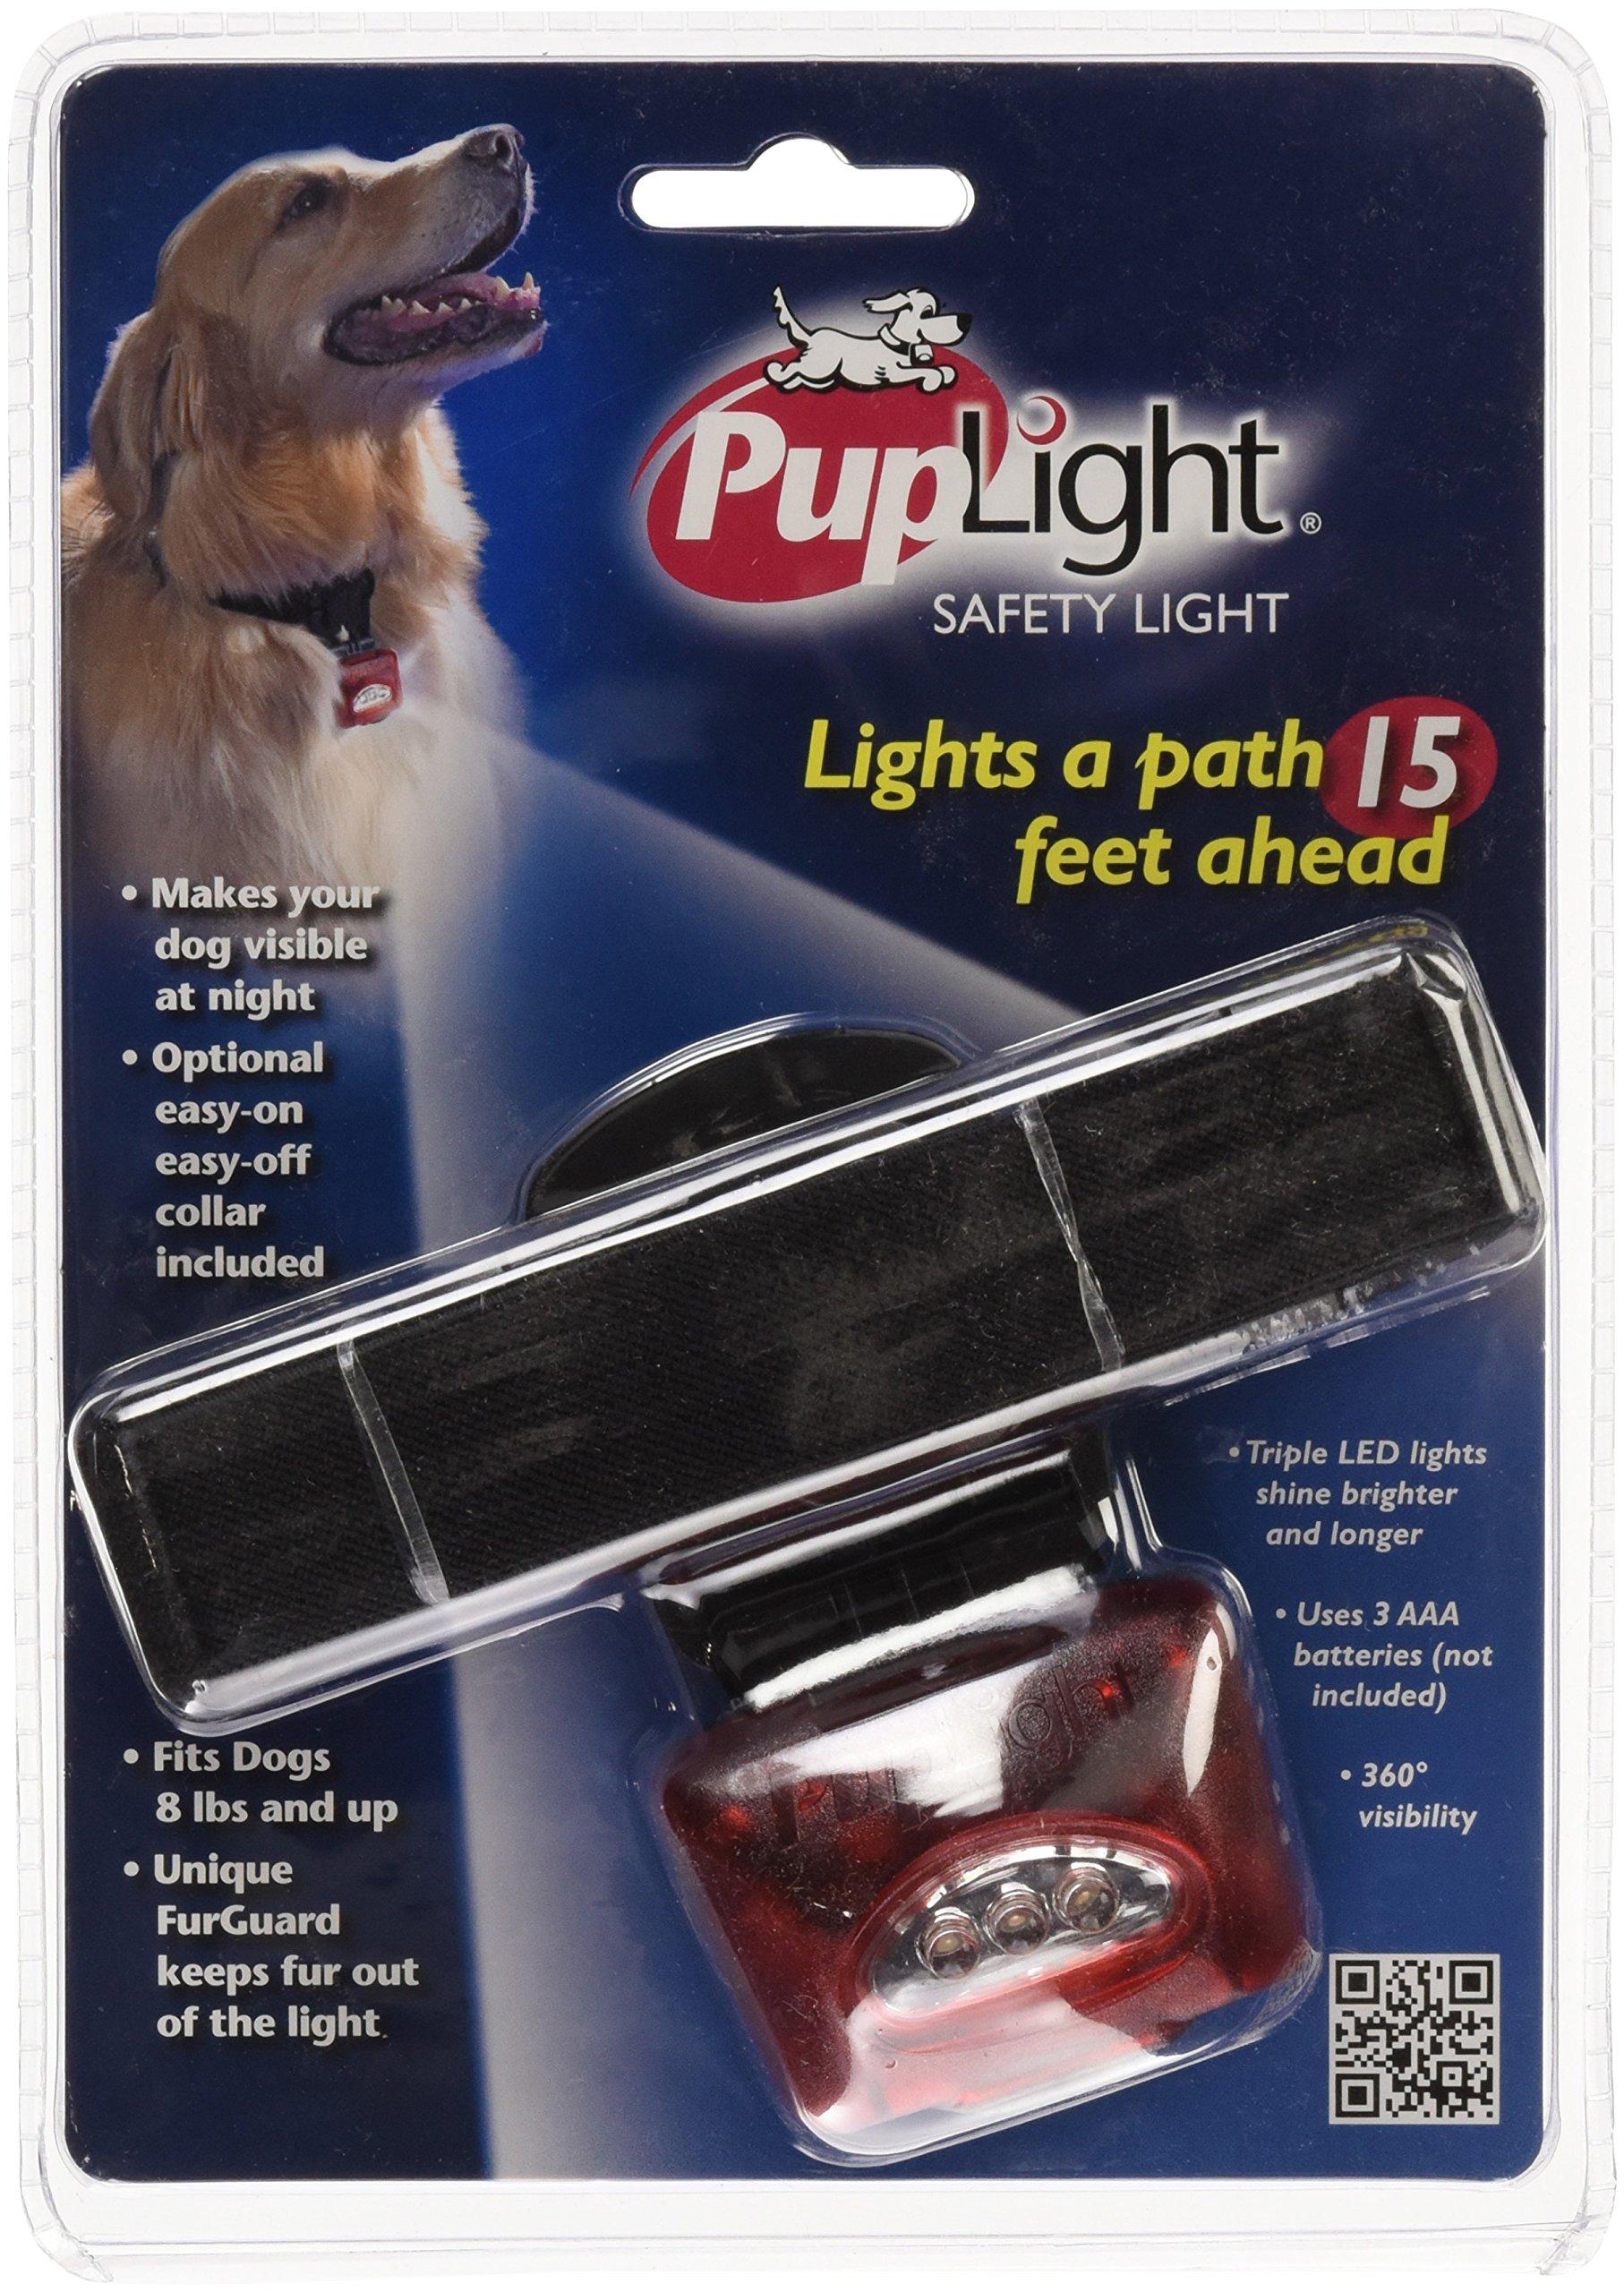 PupLight Dog Safety Light, Red by PupLight (Image #1)